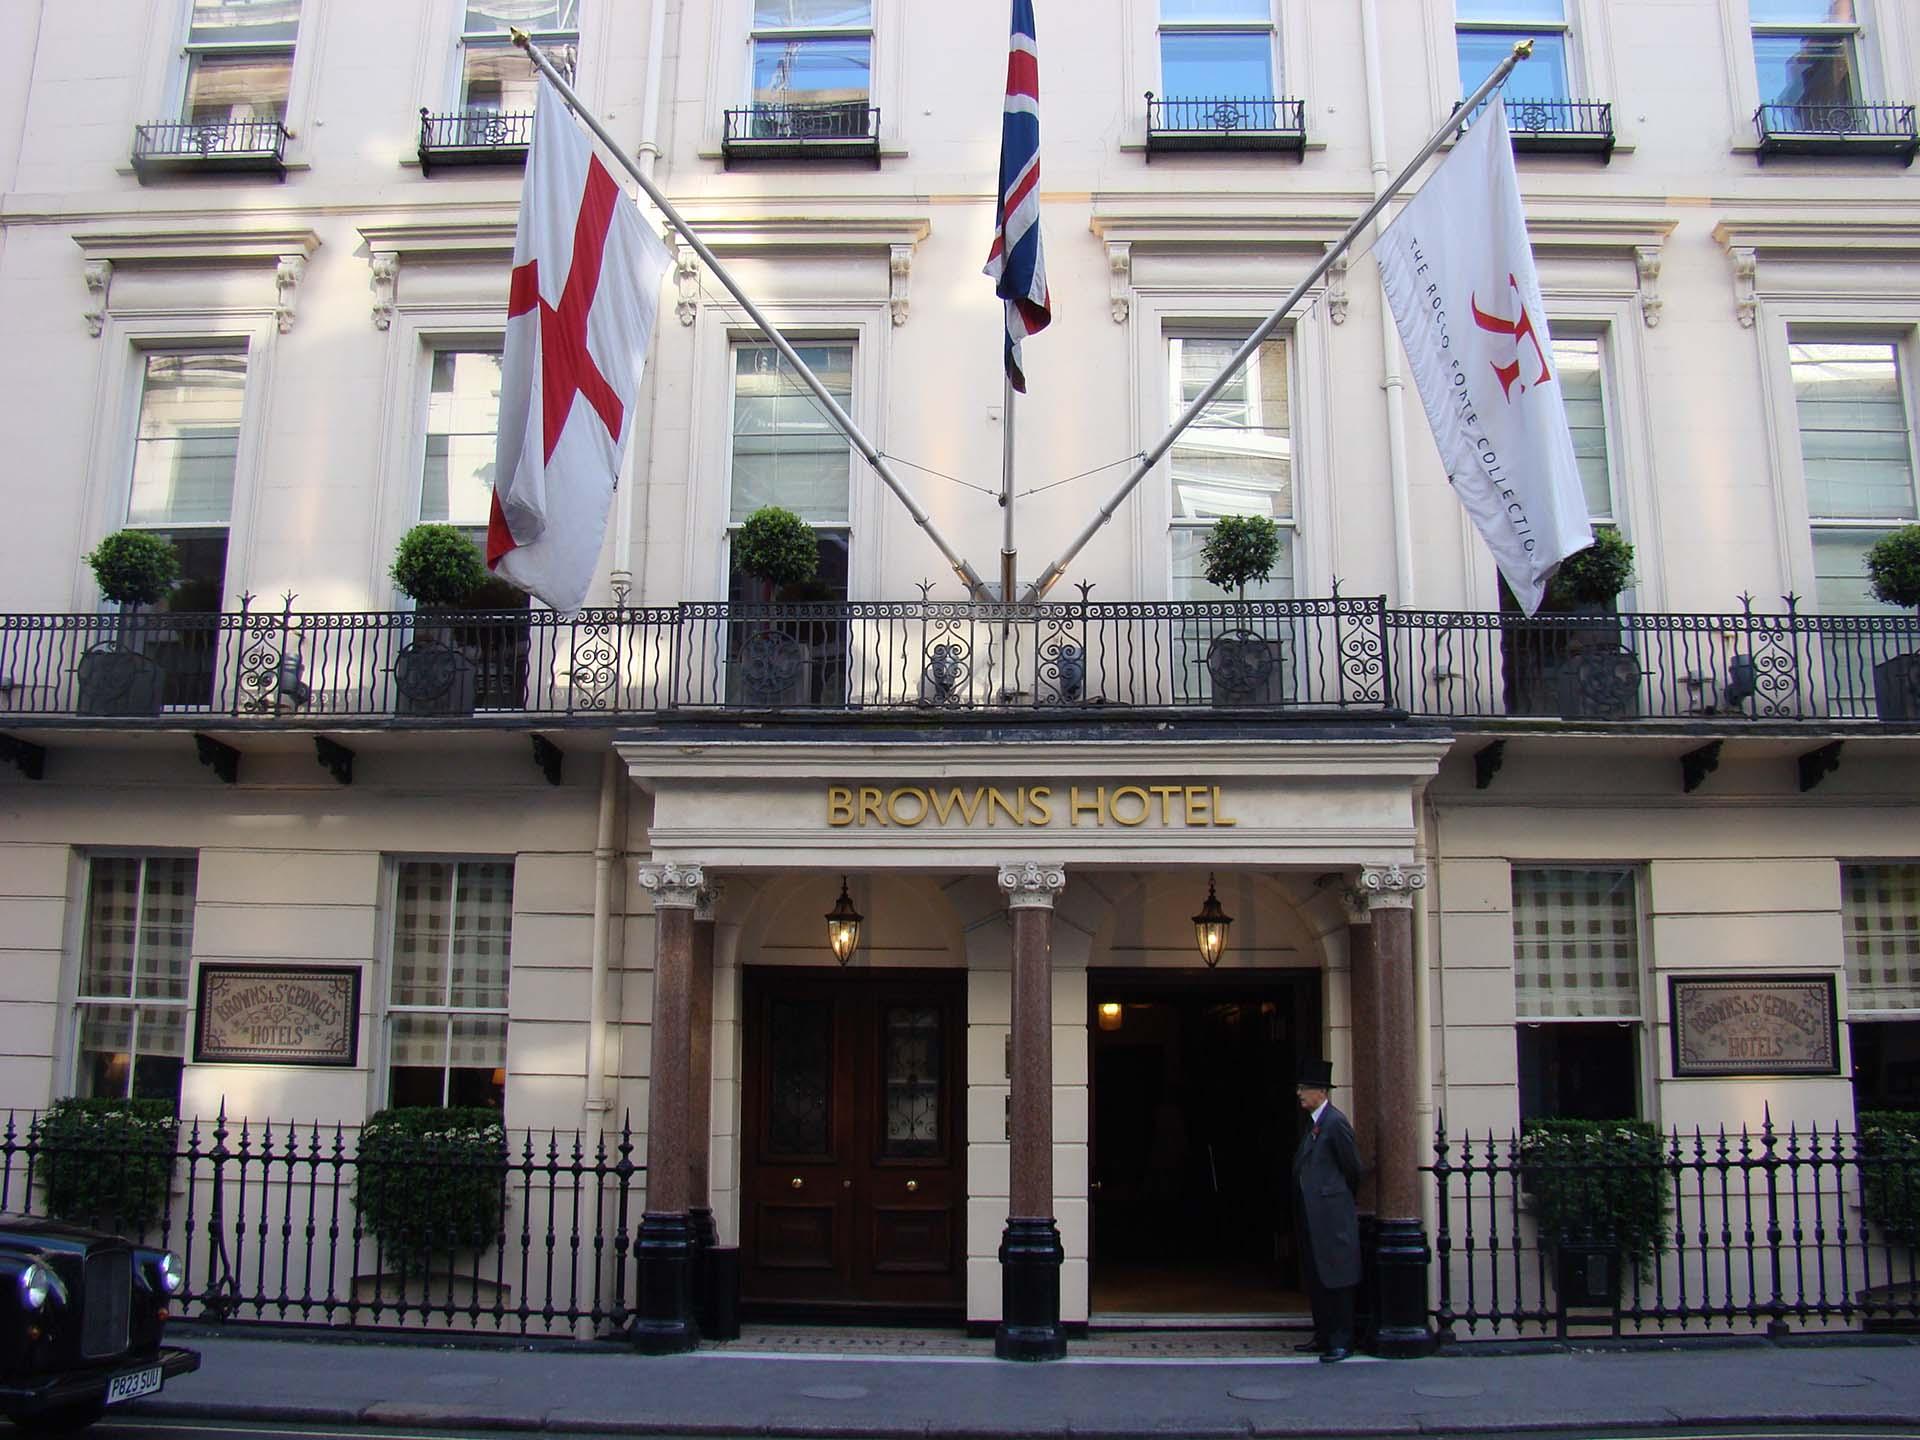 Brown's Hotel London